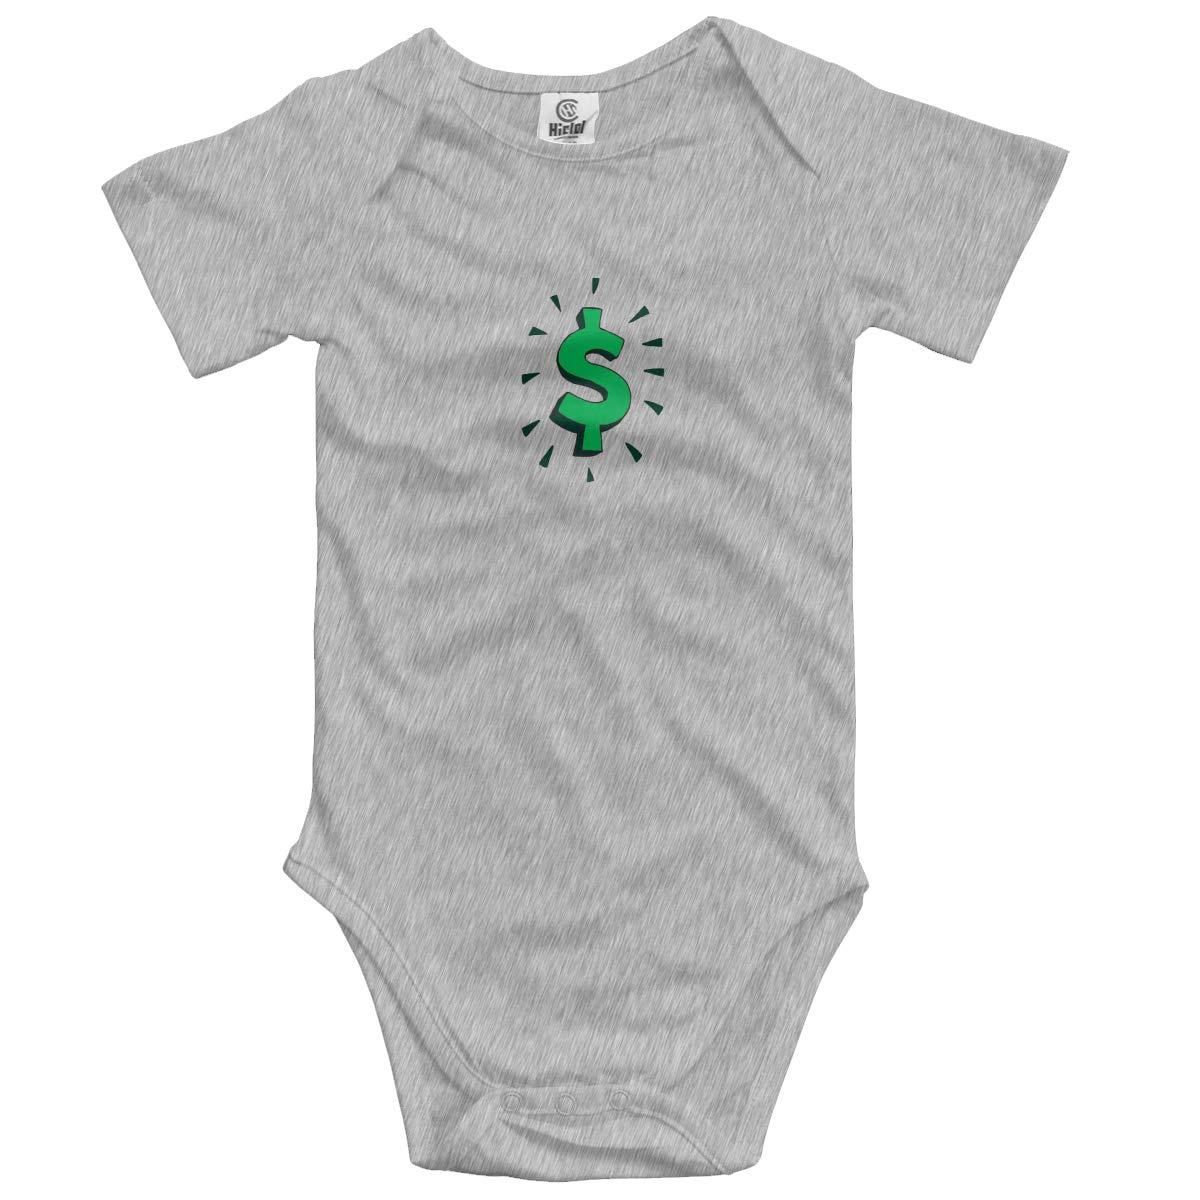 XHX Newborn Infant Dollar Sign Short Sleeve Romper Onesie Bodysuit Jumpsuit